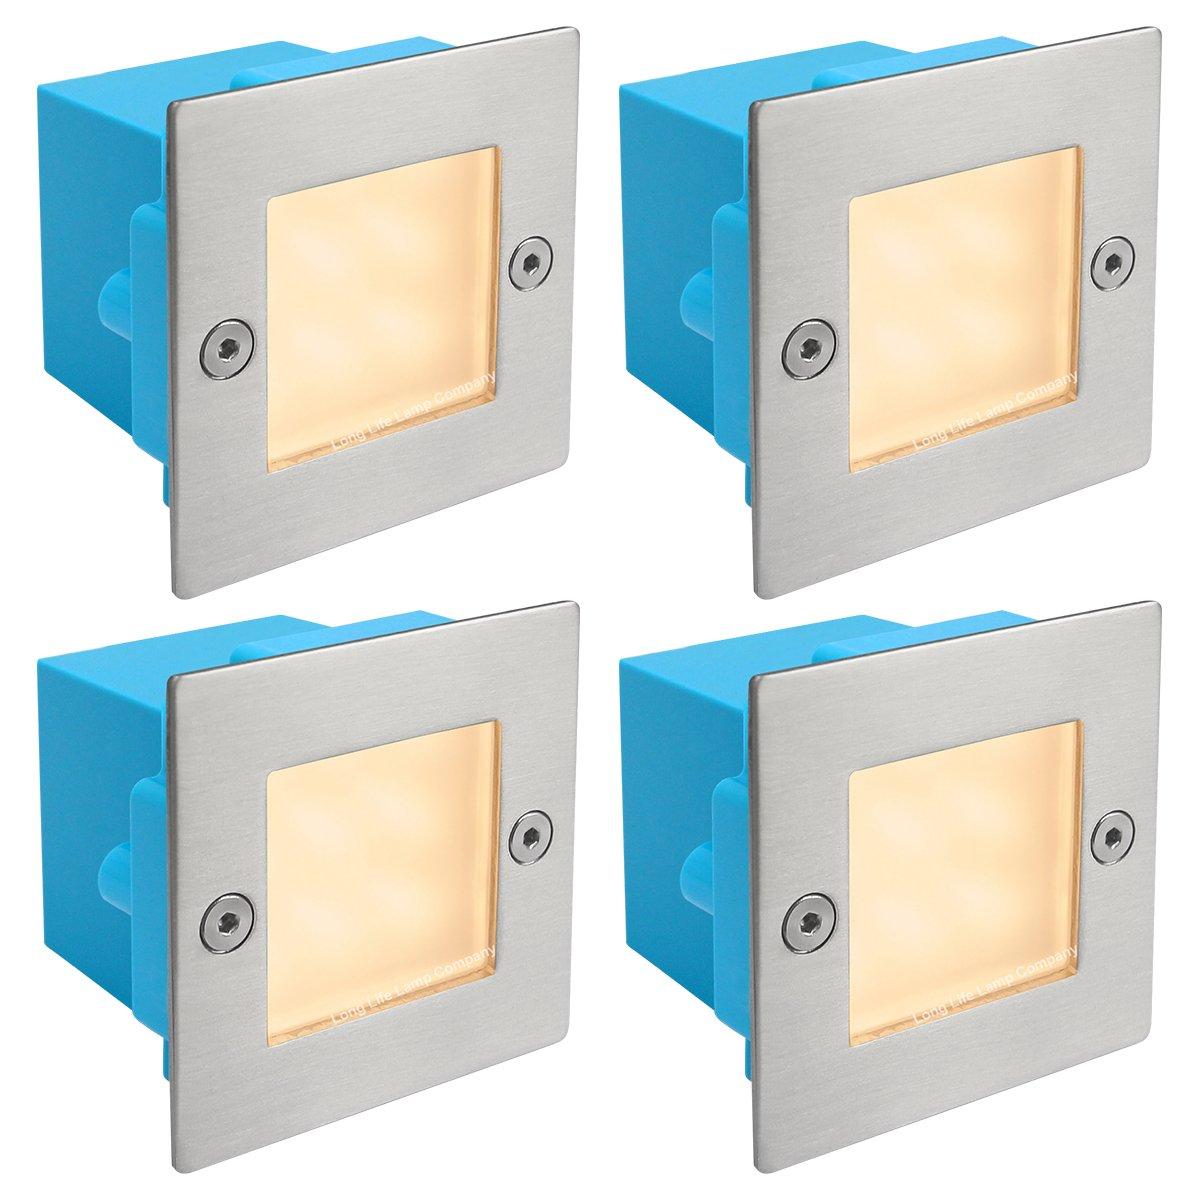 4 x Mini Brick Light LED Outdoor Step Light 70mm Square IP54 Warm White Recessed Wall Light ZLC051WW